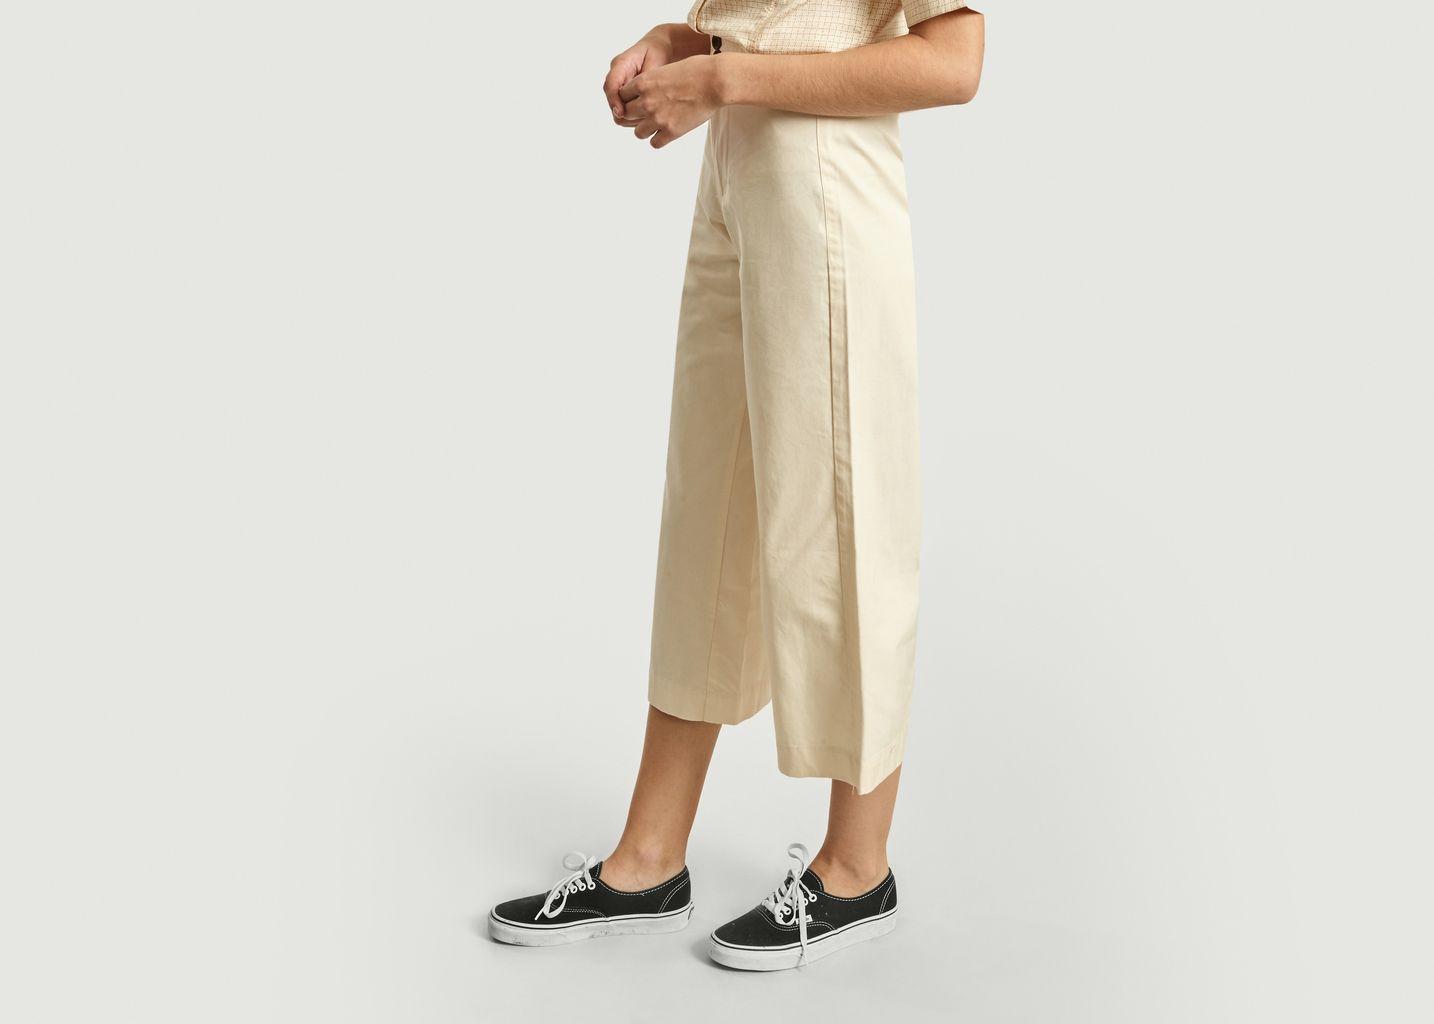 Pantalon large 7/8e en coton bio - Thinking Mu